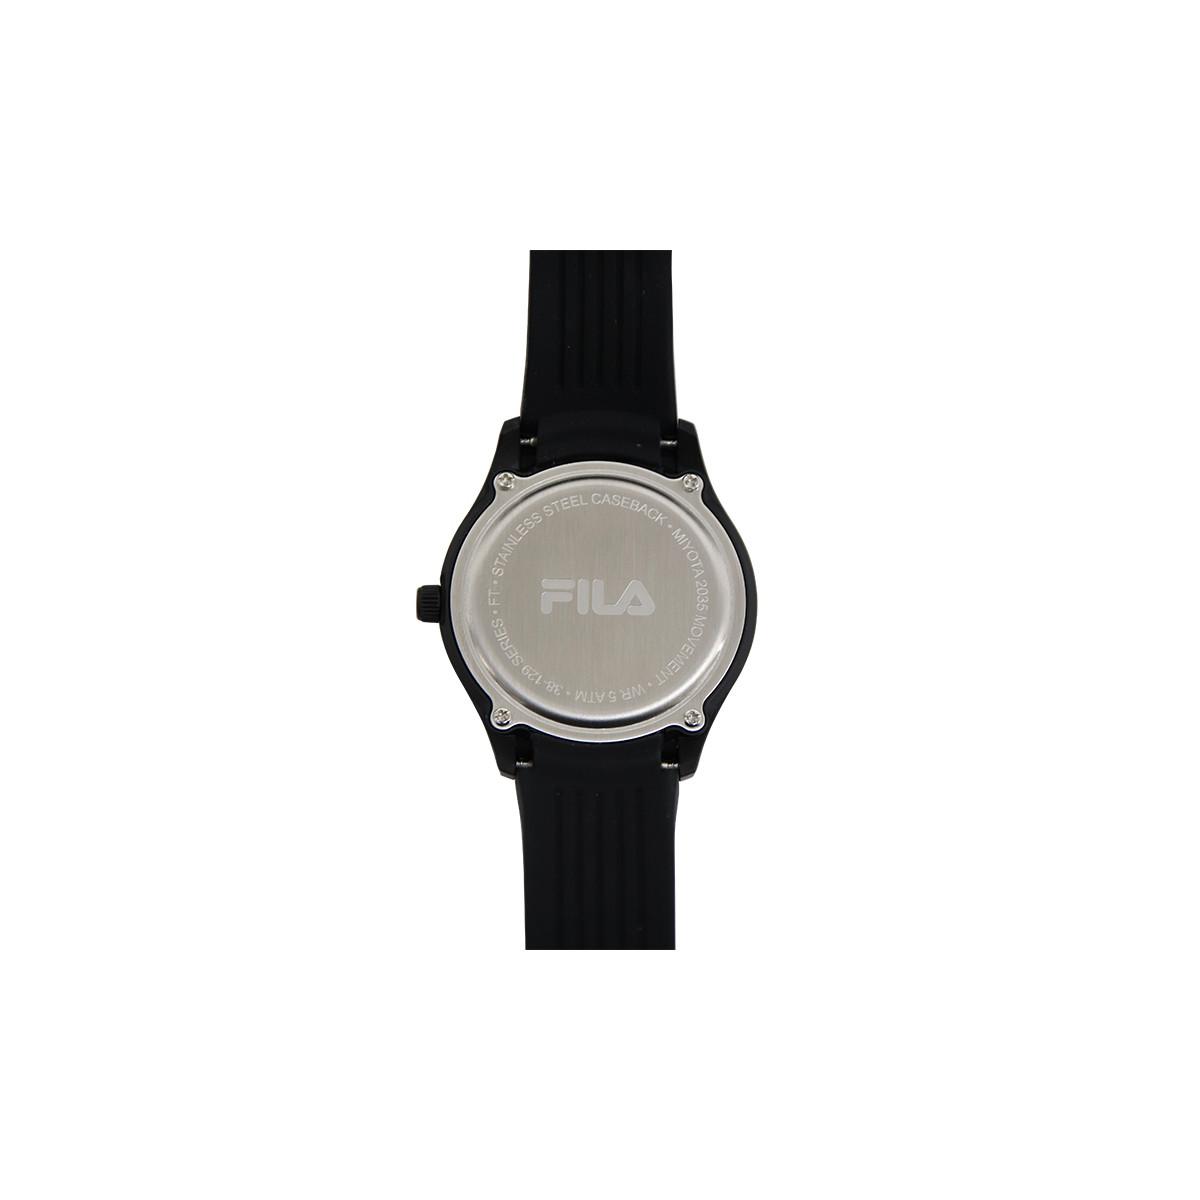 Montre homme FILA cadran blanc - 38-129-205